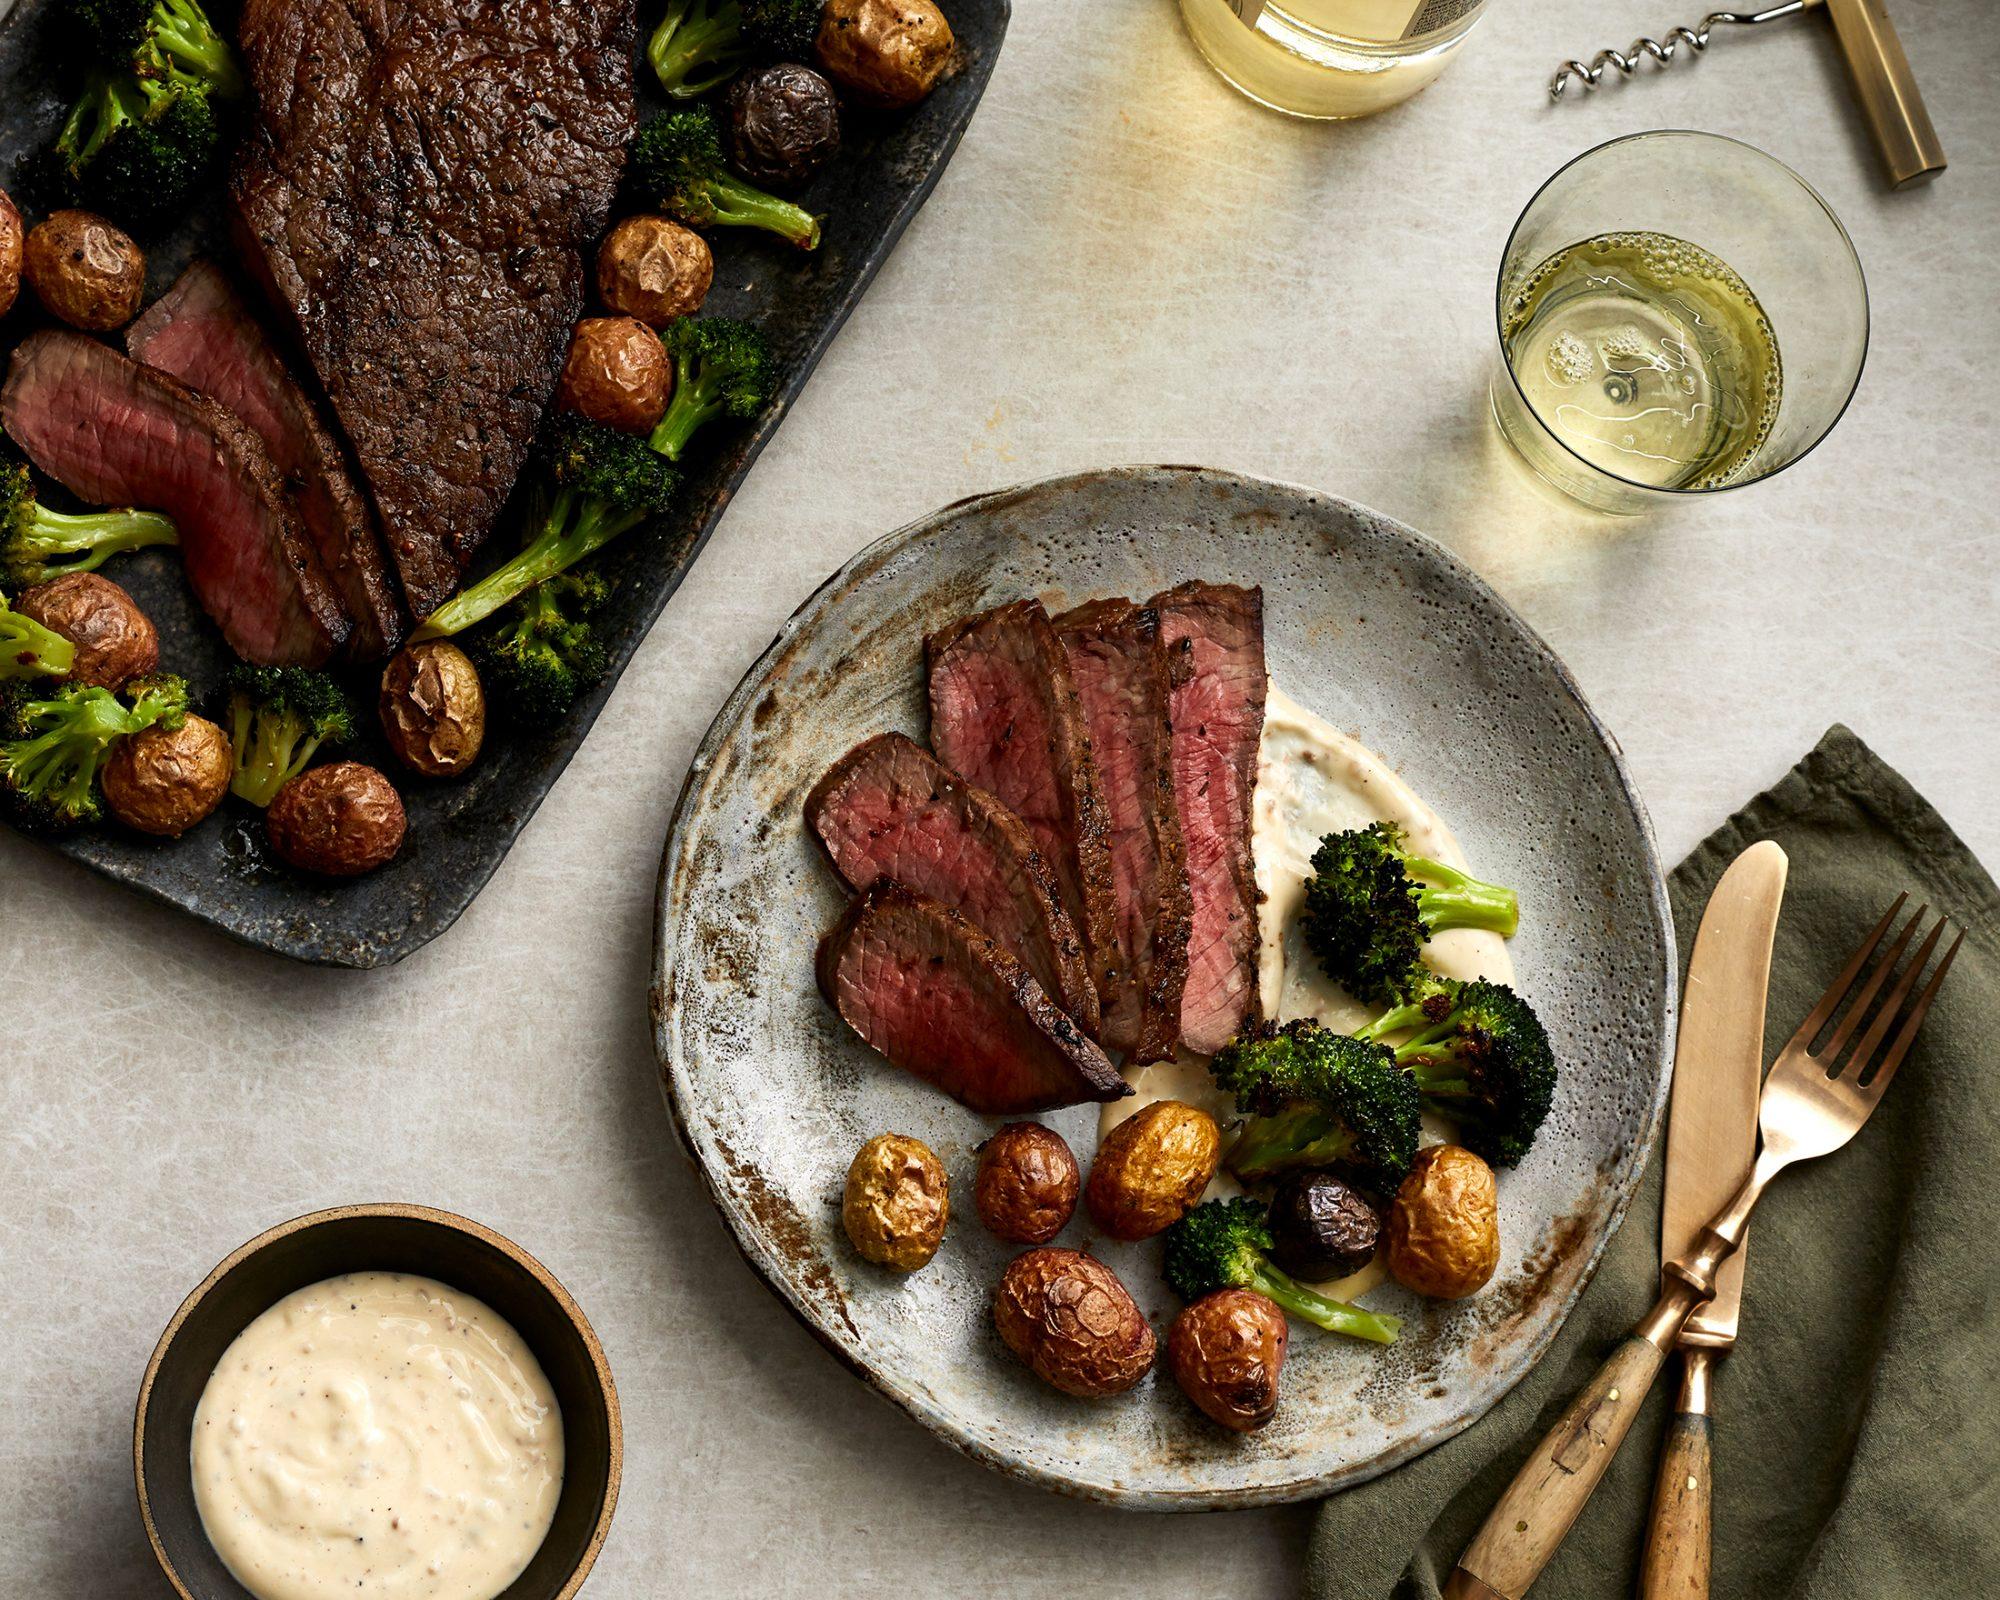 Marinated London Broil with Potatoes, Broccoli, and Roasted Garlic Aioli image